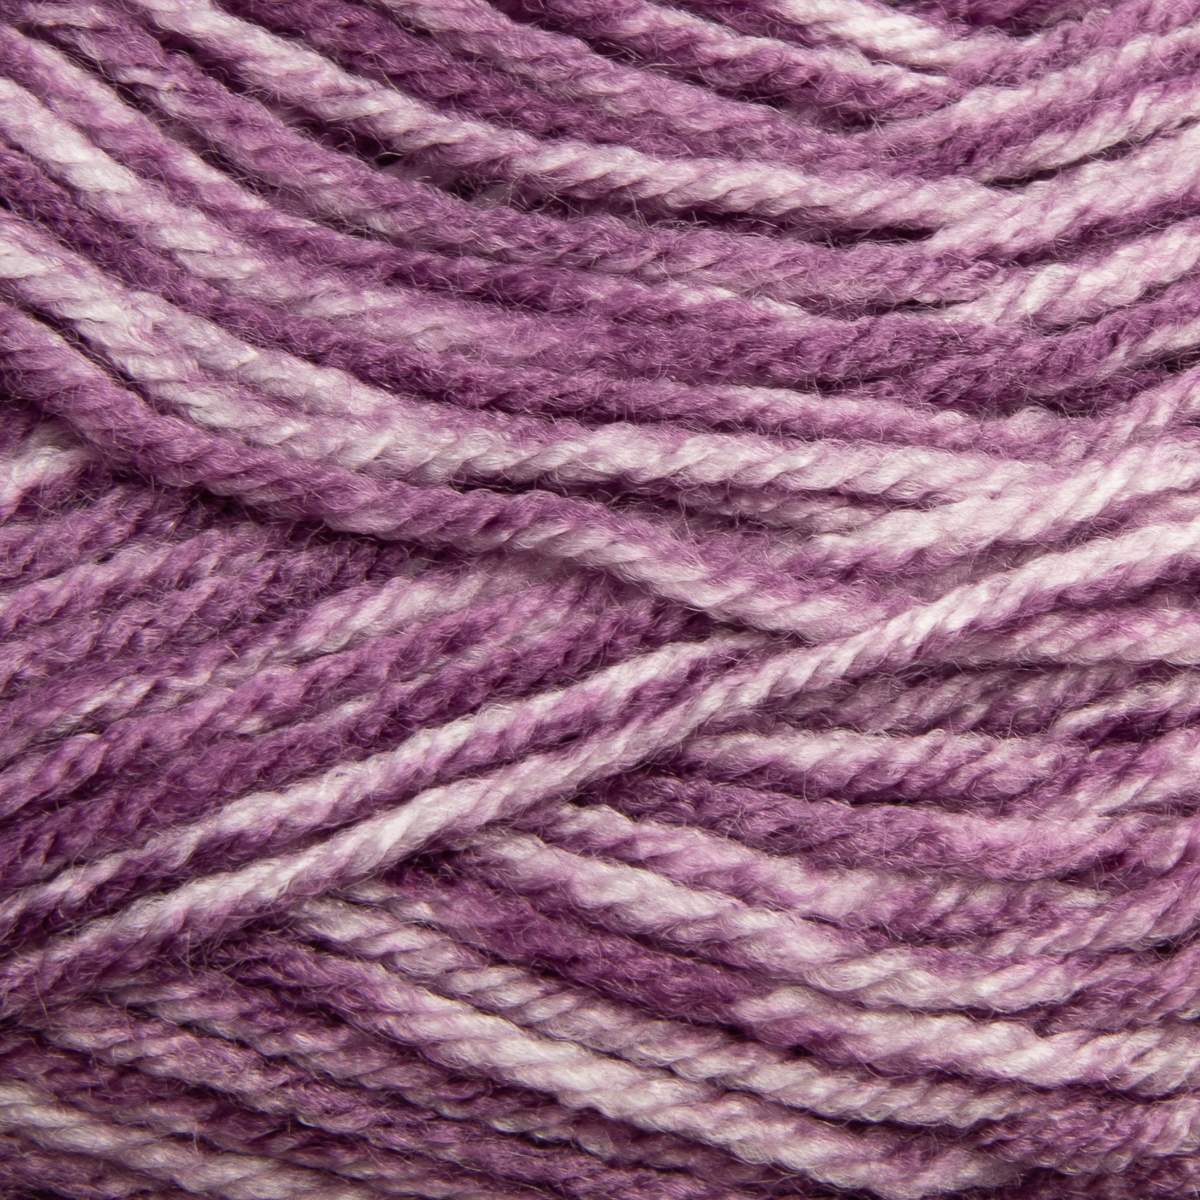 3pk-Lion-Brand-Vanna-s-Choice-100-Acrylic-Yarn-Medium-4-Knitting-Skeins-Soft thumbnail 39